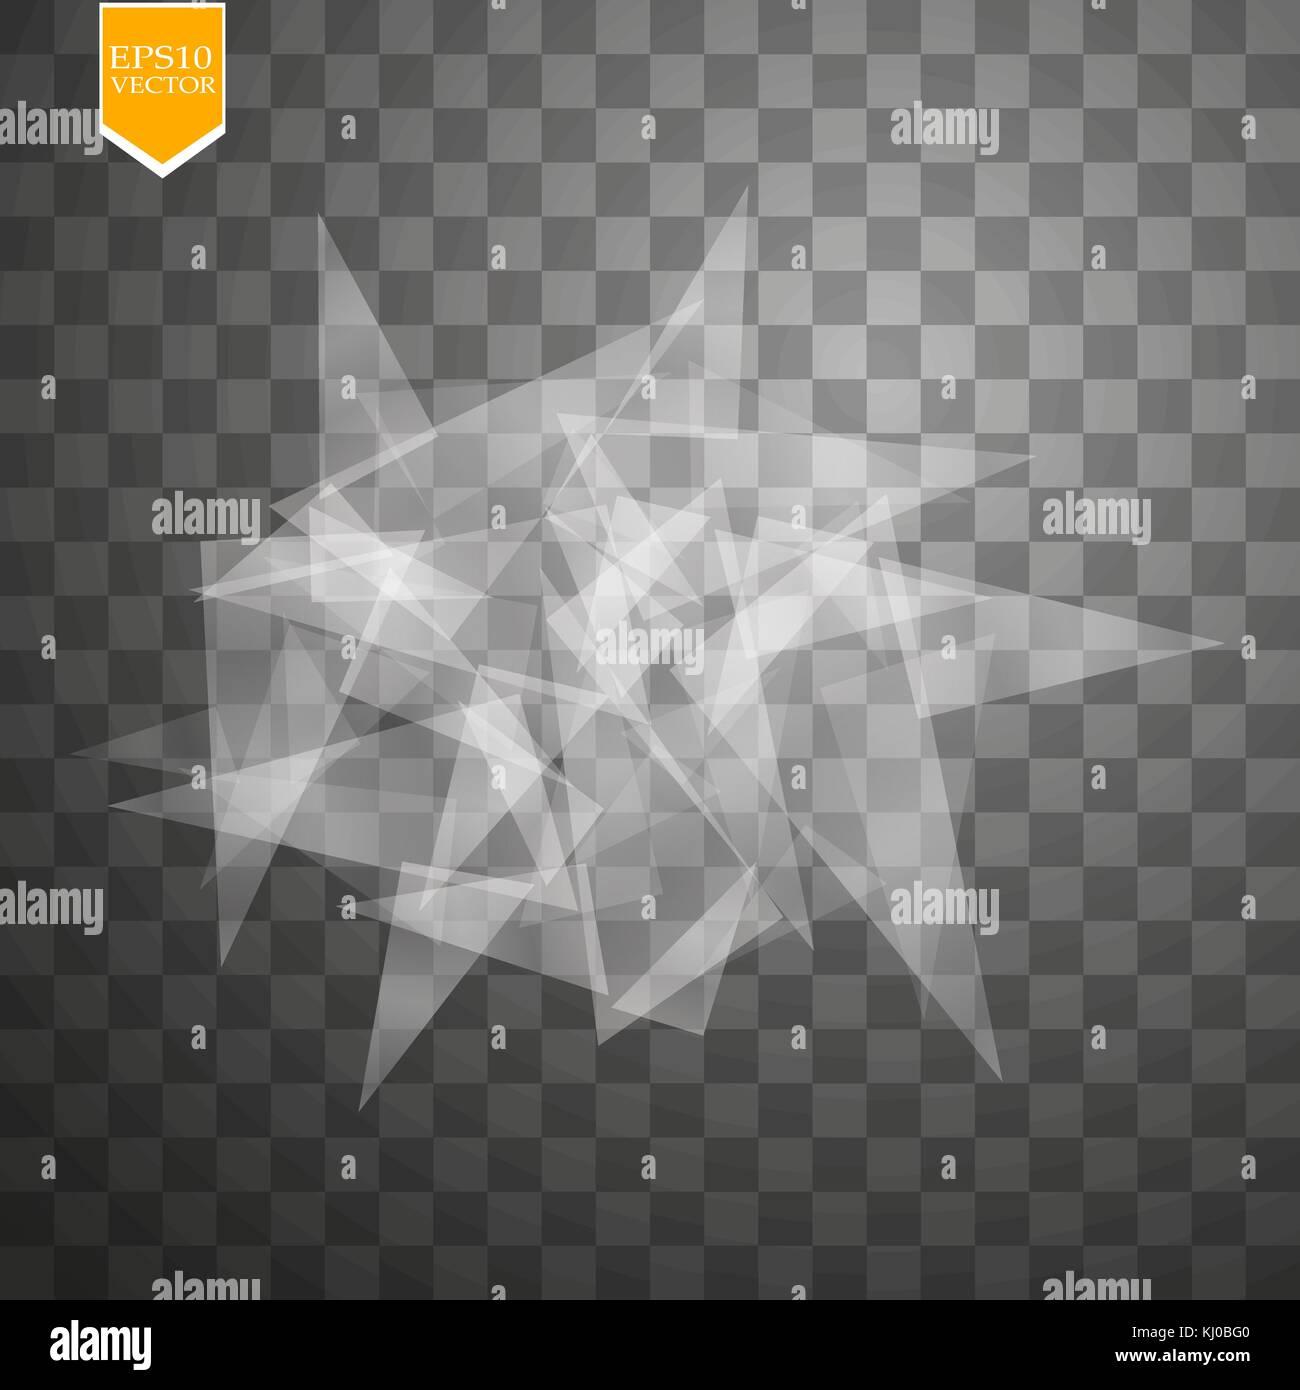 Transparent broken glass on transparent background. Vector illustration - Stock Vector